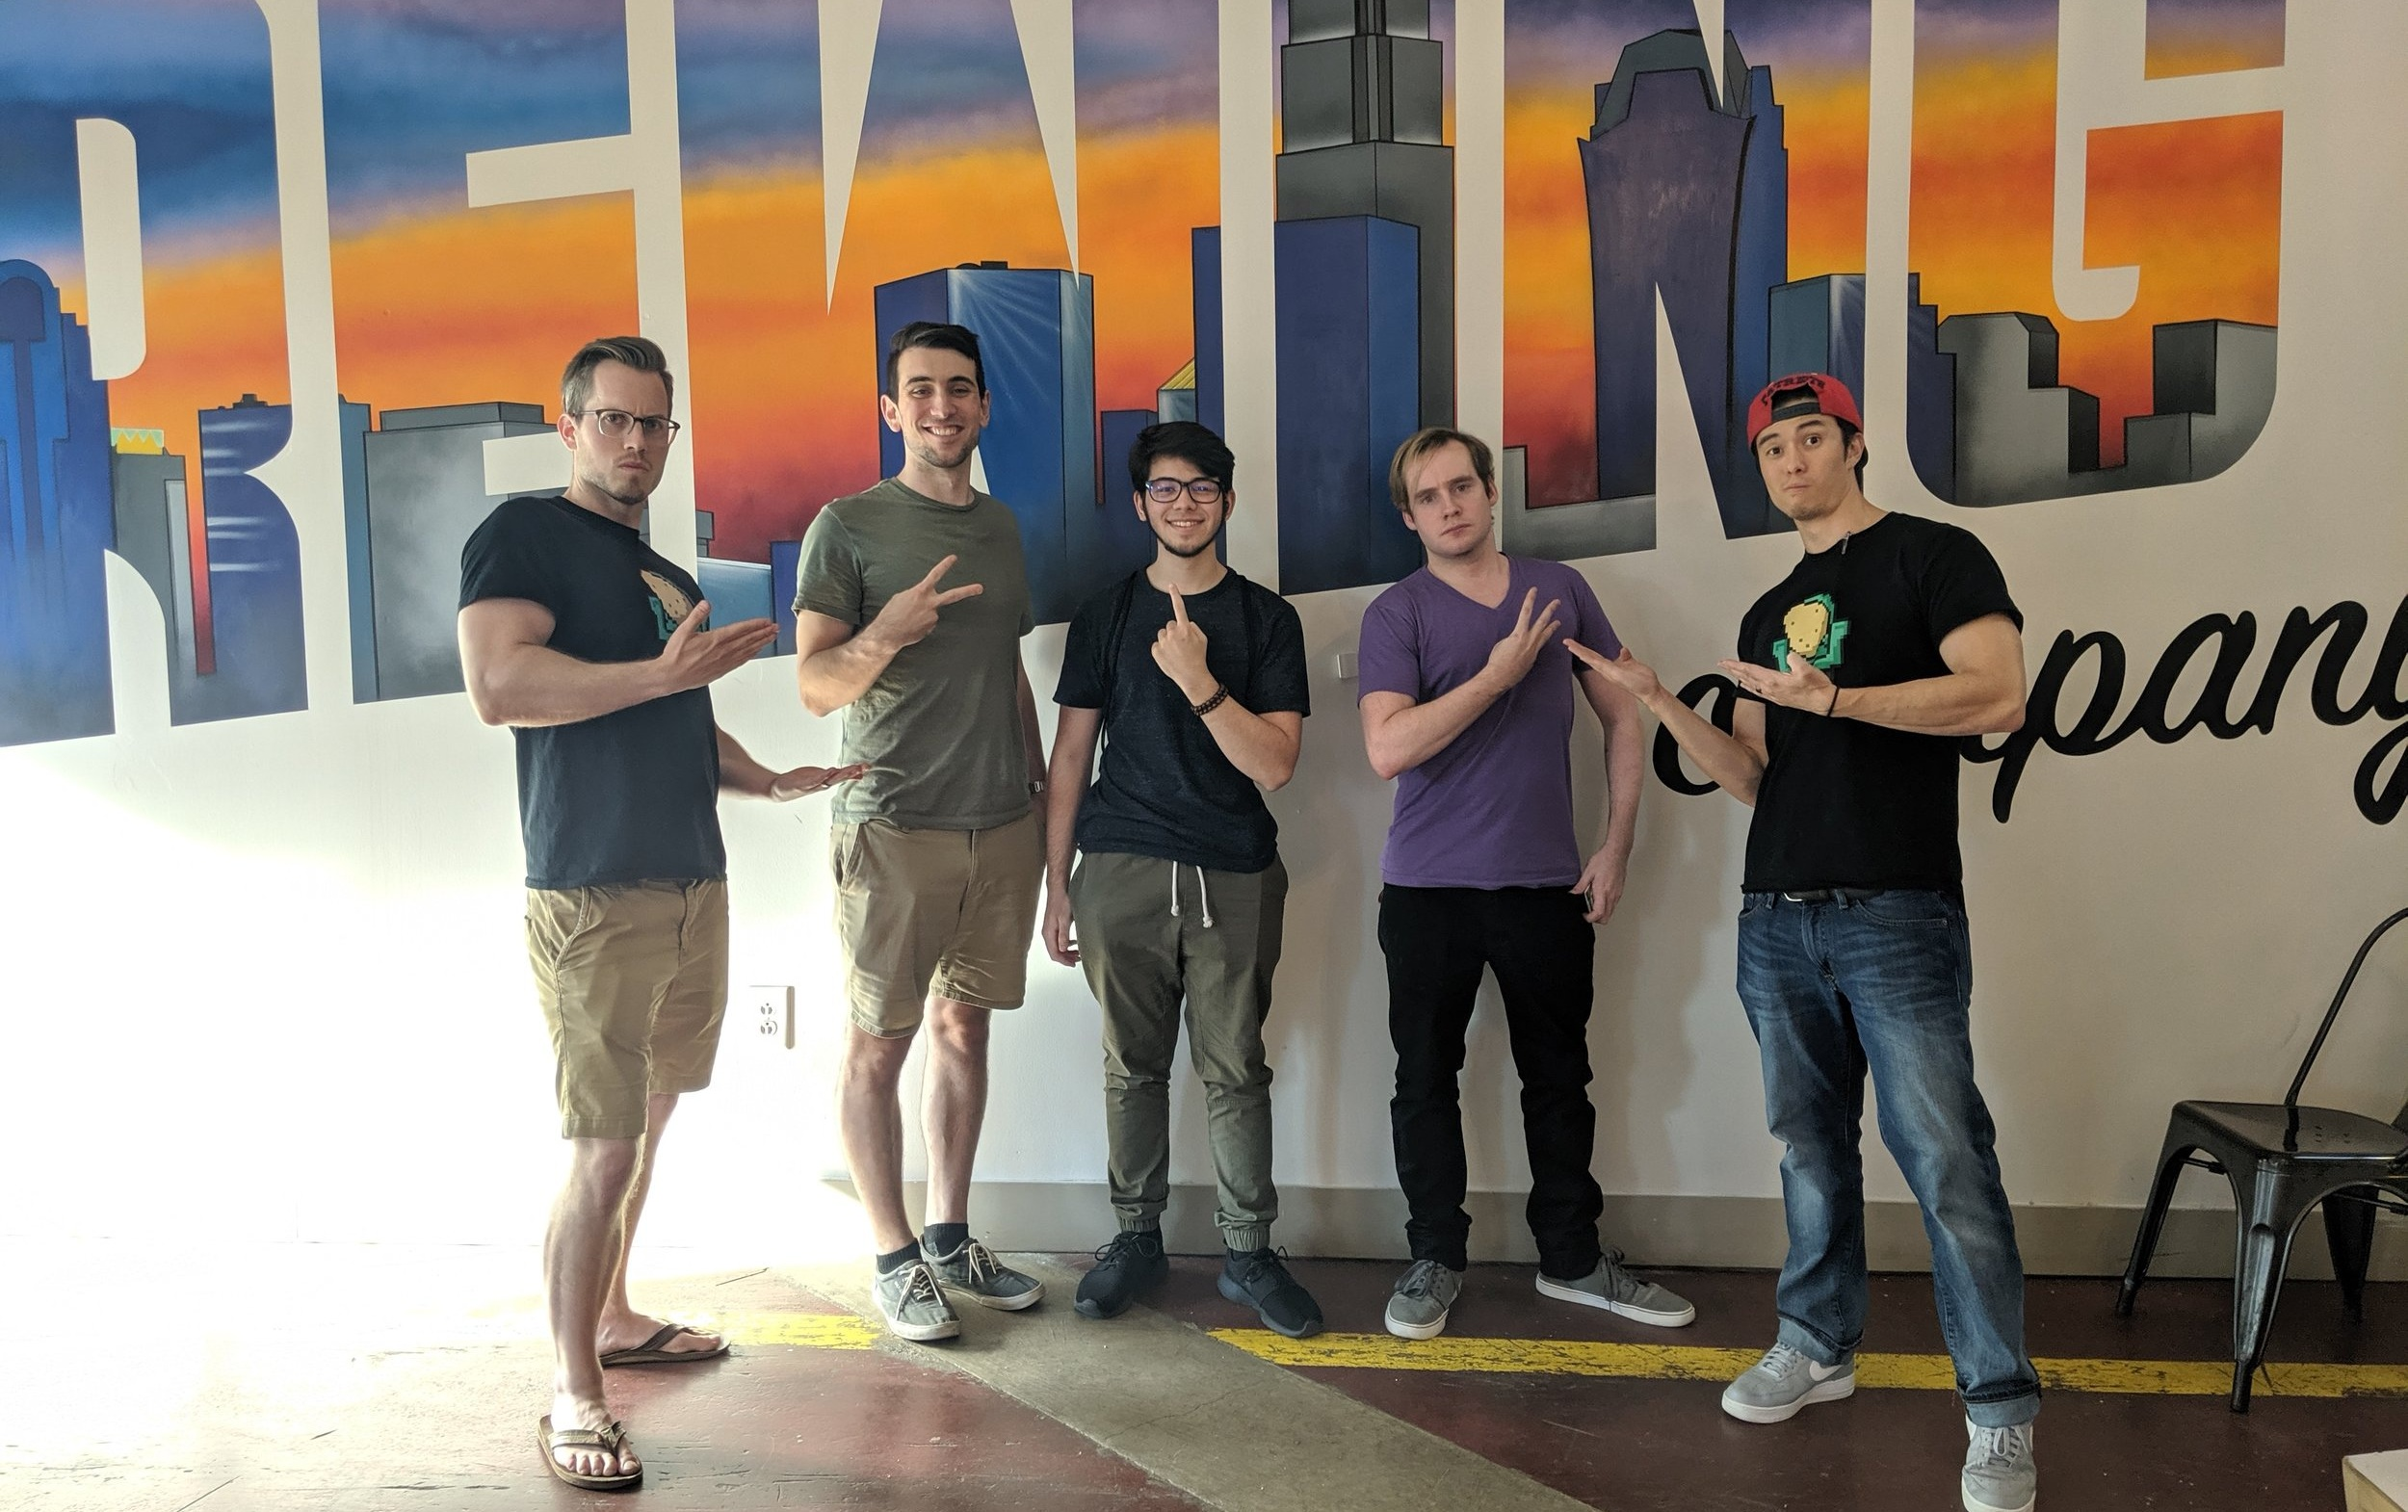 June 15th - Catawba Brewing Smash Ultimate Tournament Bracket - https://braacket.com/tournament/catawba0615/match